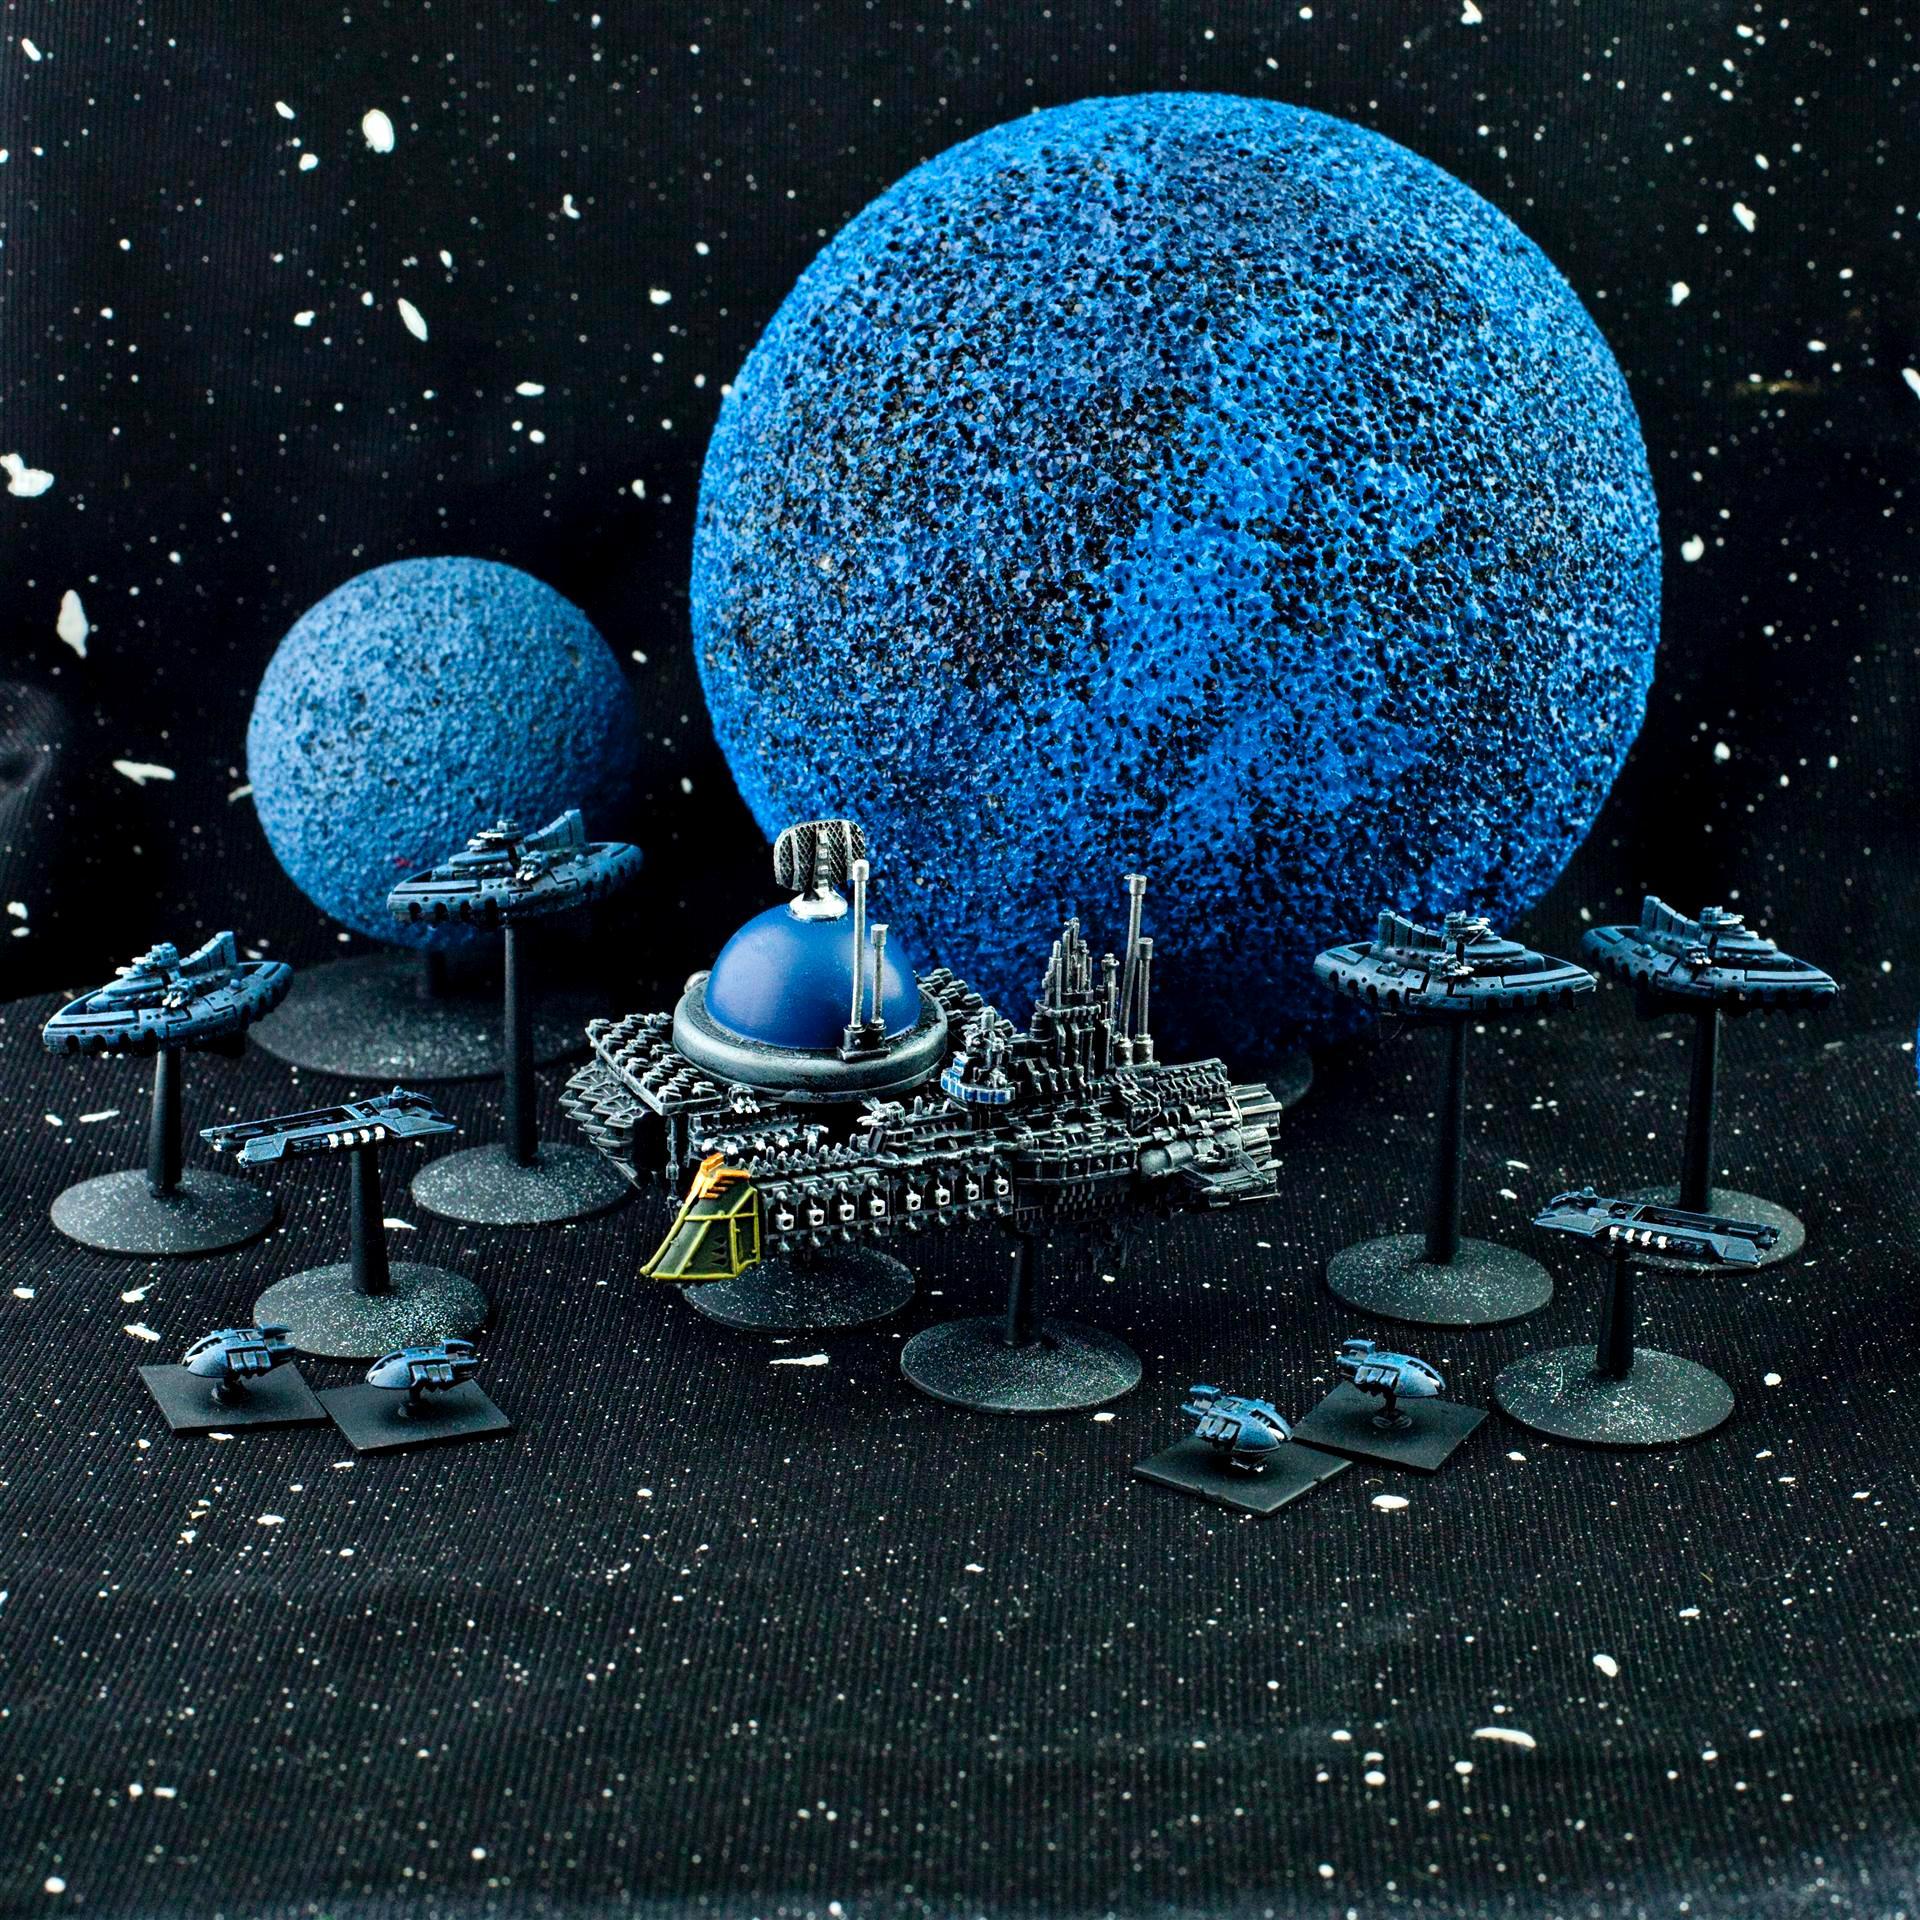 Assault Boat, Assault Boats, Battlefleet Gothic, Cruiser, Dockyard, Escort, Fleet, Imperial, Imperials, Moon, Ordos Xenos, Planet, Rogue Trader, Rogue Trader Cruiser, Secret Base, Space Dock, Space Station